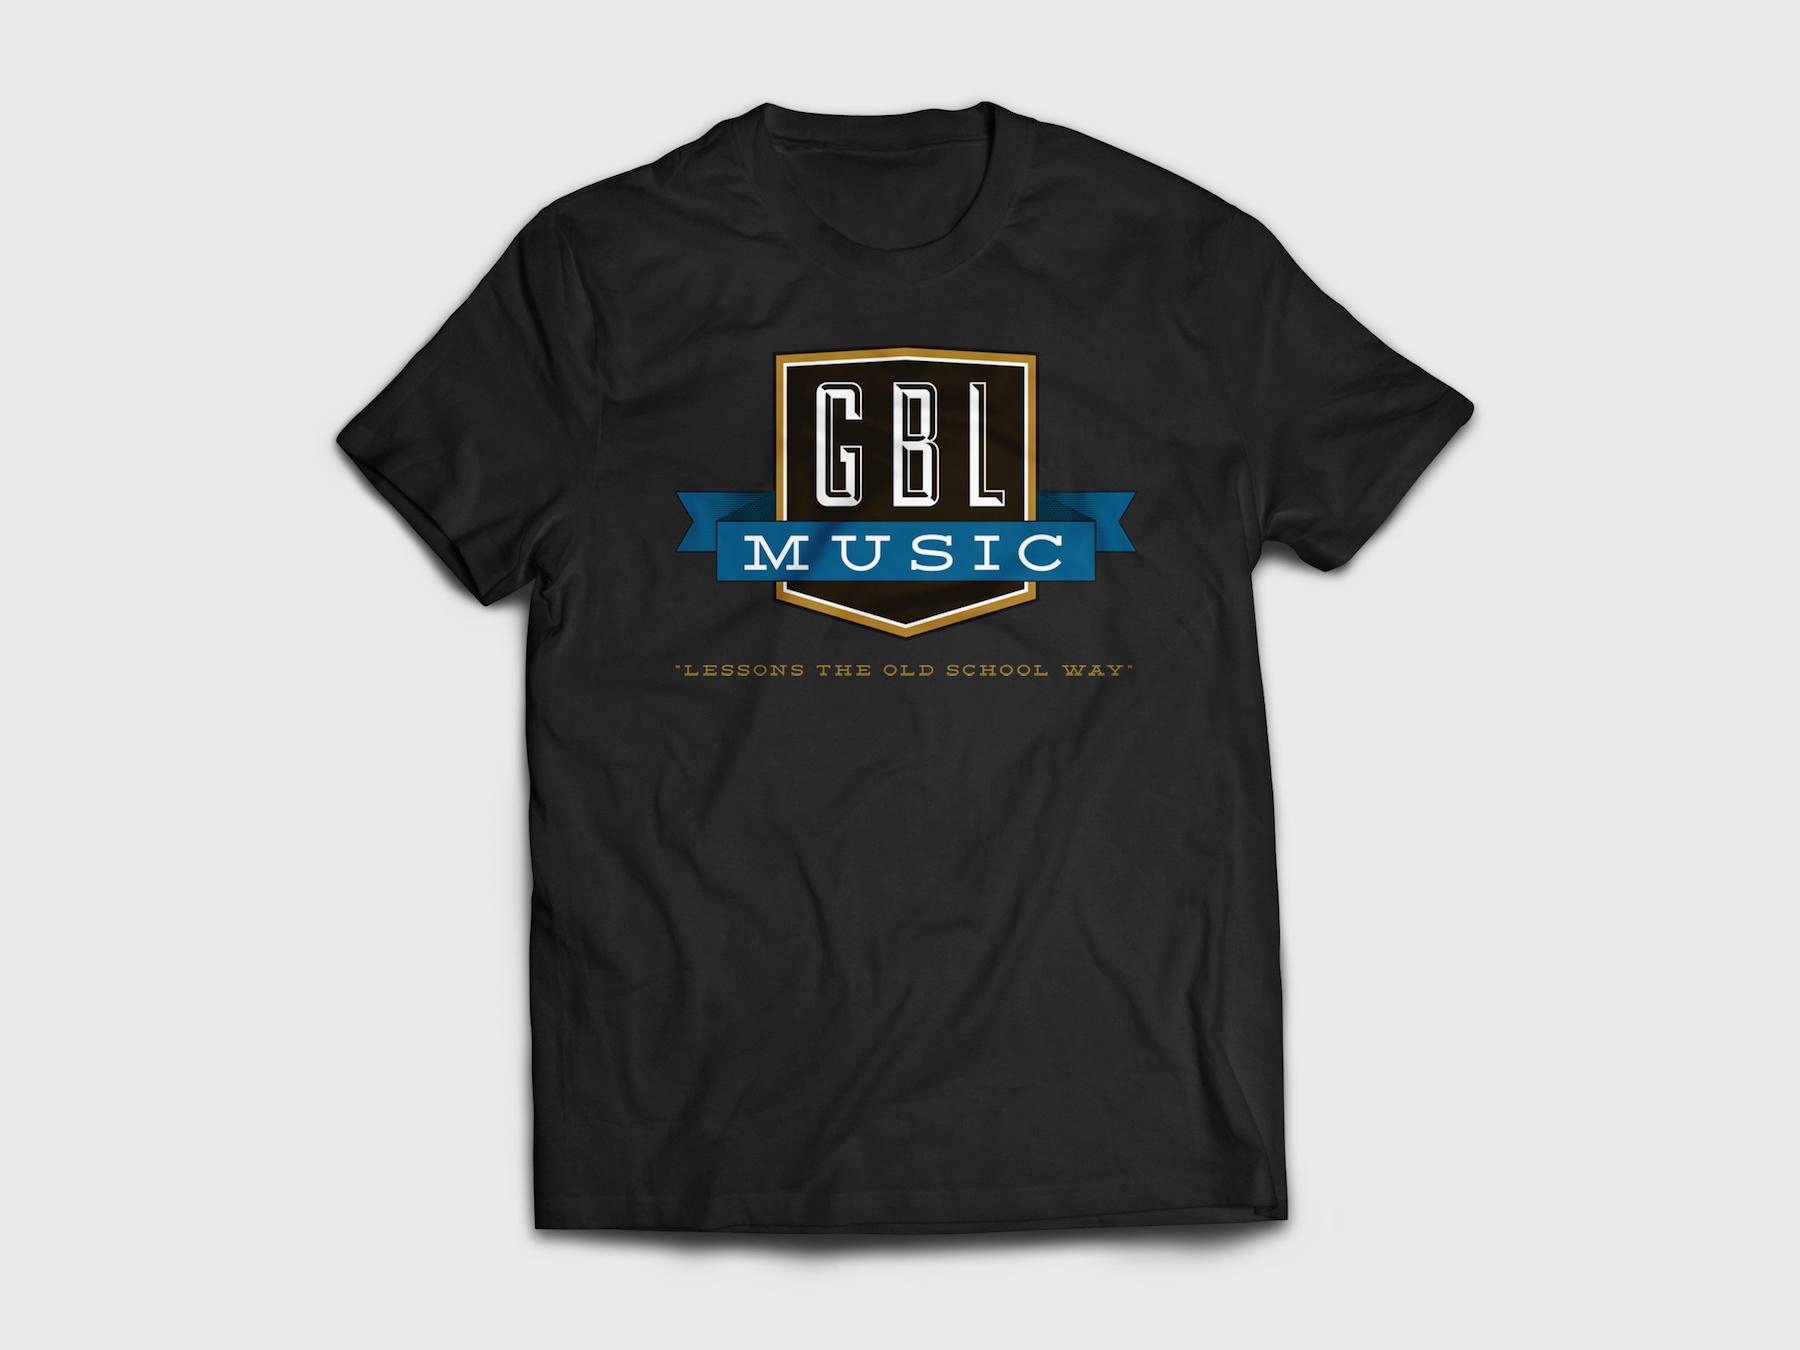 Golden-Antler-Design-Milwaukee-Web-Branding-Marketing-GBL-Music-Apparel-Printing